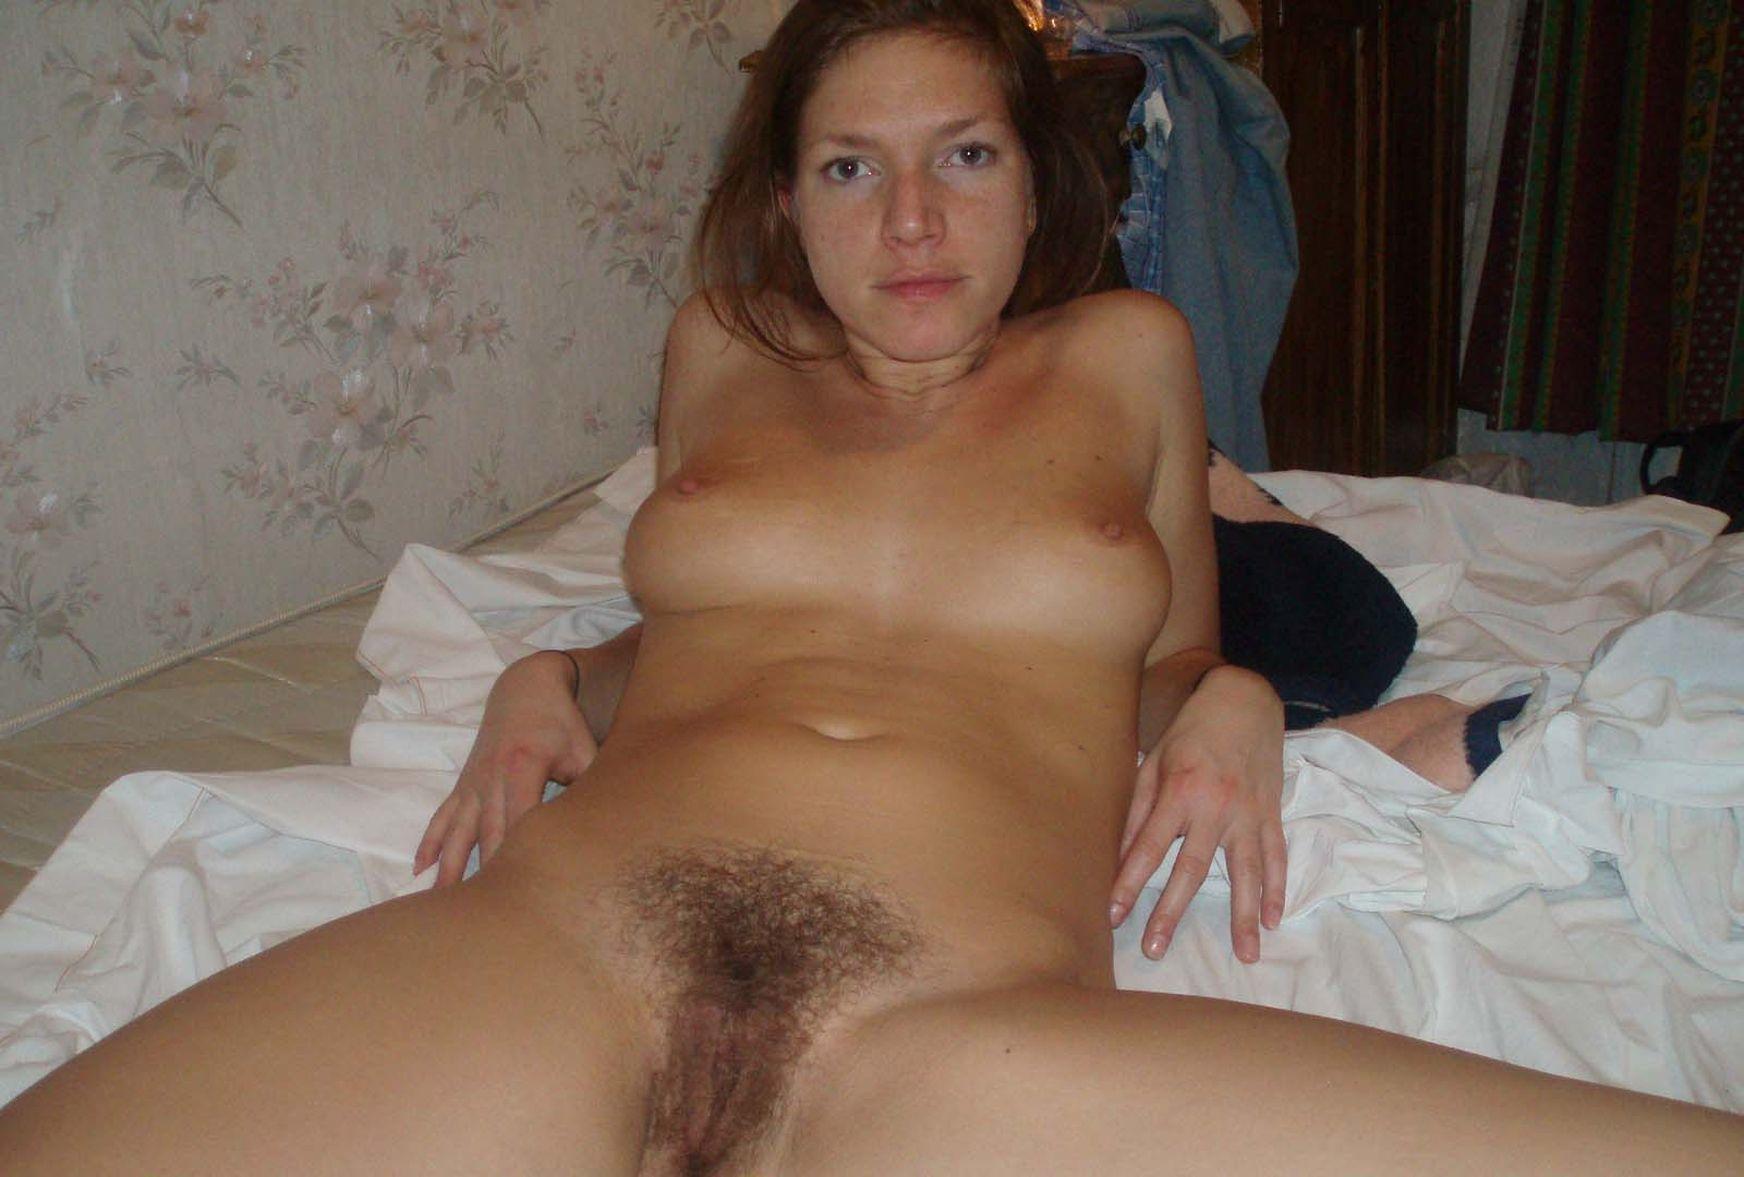 date for gifte sexkontakte